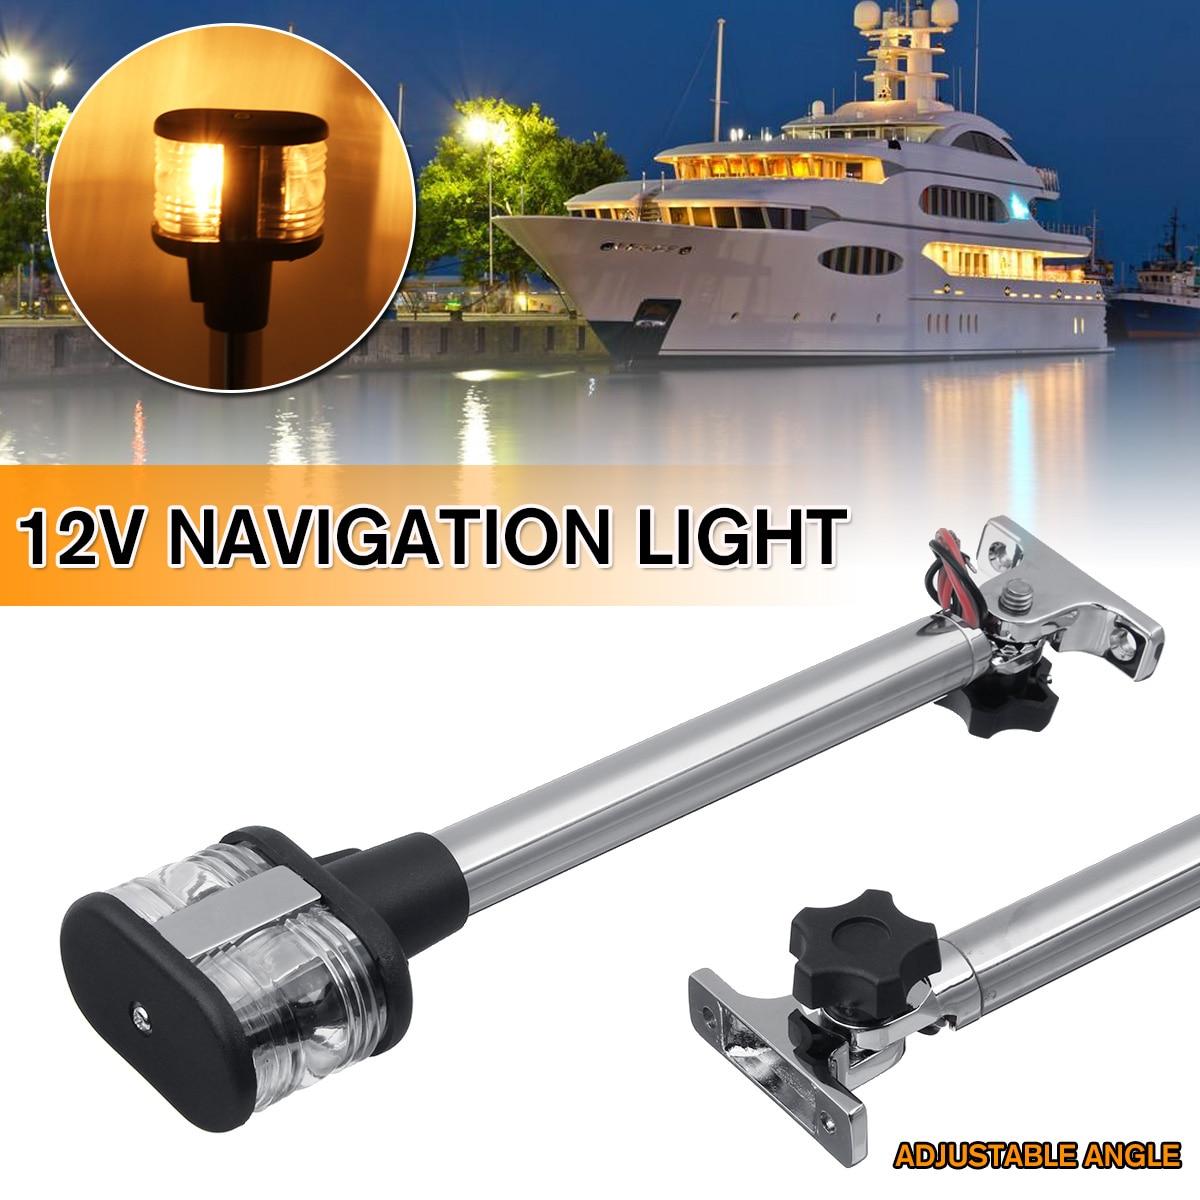 Fold Down Fold Down LED Navigation Light For Yacht Boat Stern Anchor Light 12-24V 25cm Pactrade Marine Boat Sailing Signal Light